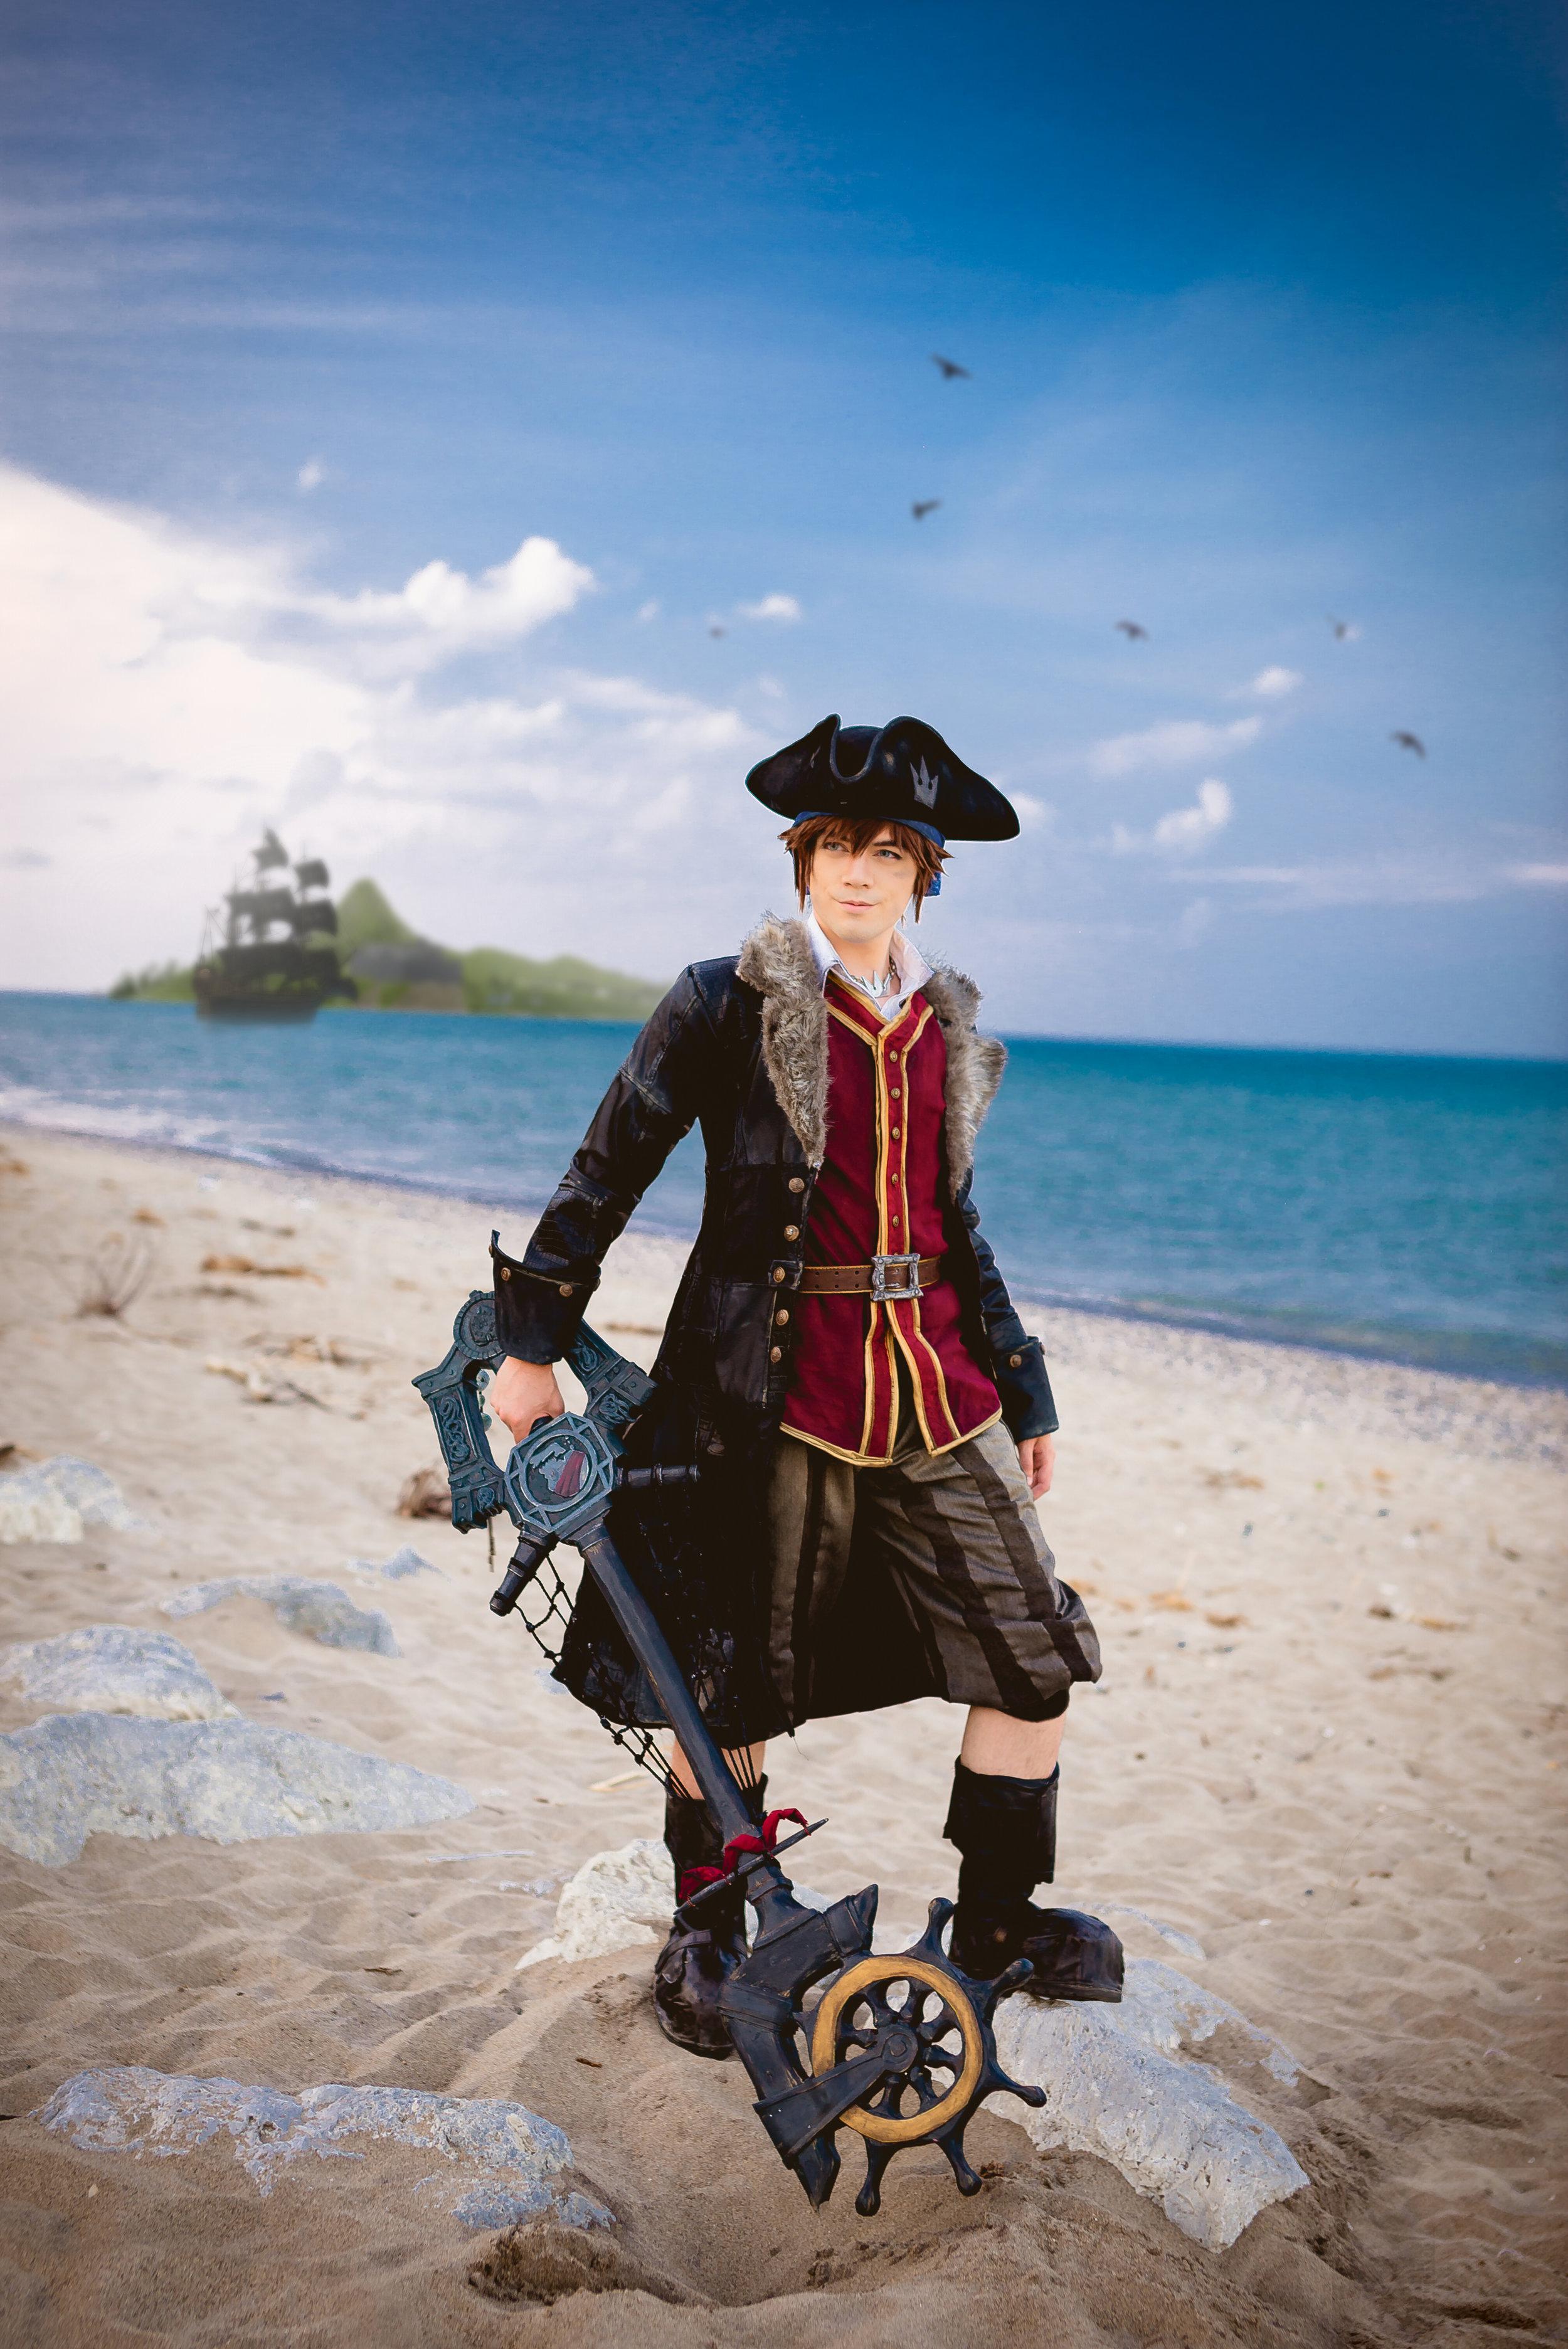 kingdom_hearts_3___pirate_sora_cosplay_by_nipahcos-dcg0hkz.jpg